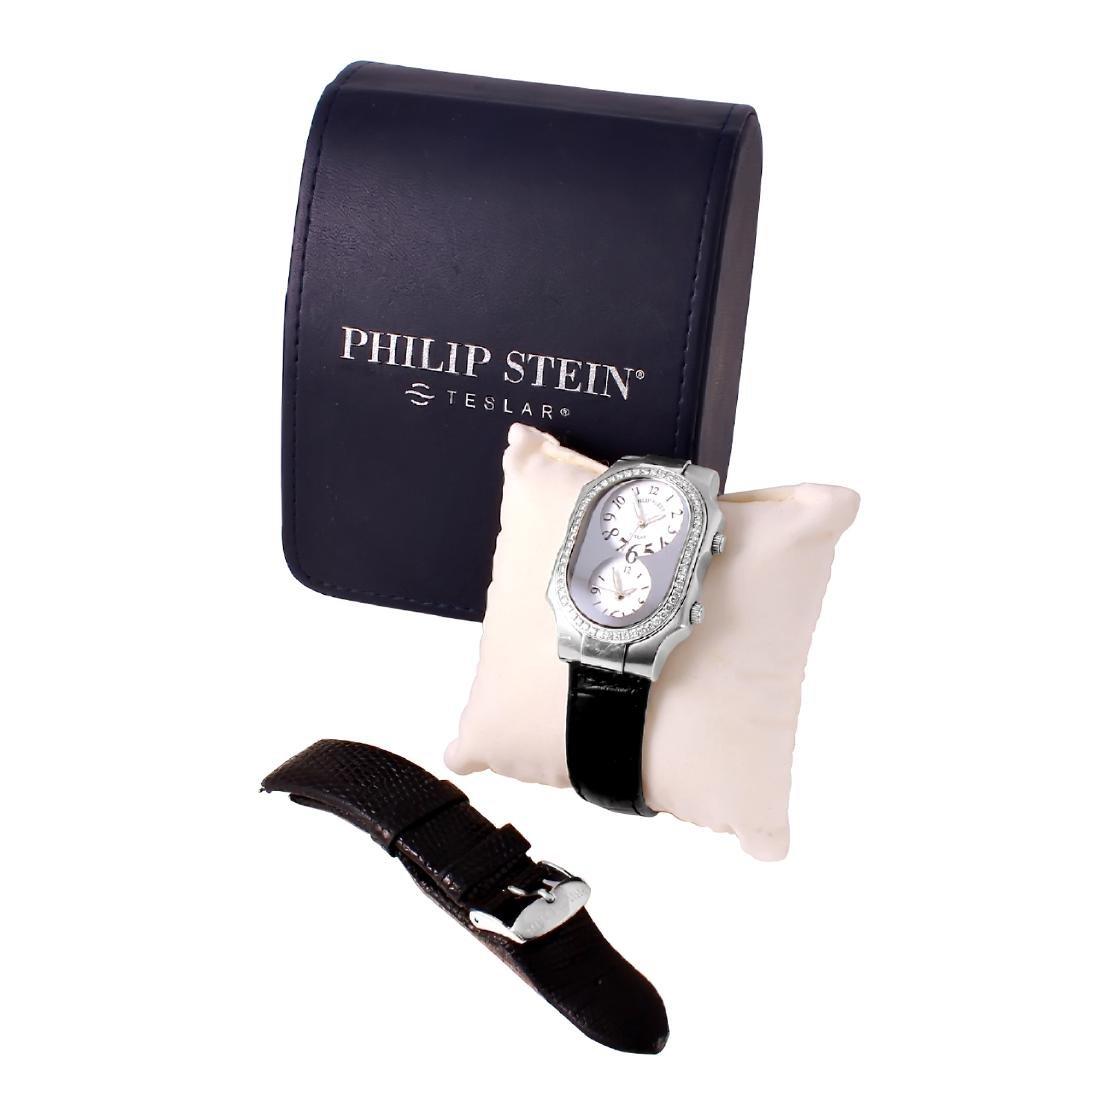 Philip Stein Teslar Stainless Steel Diamond Watch - 3